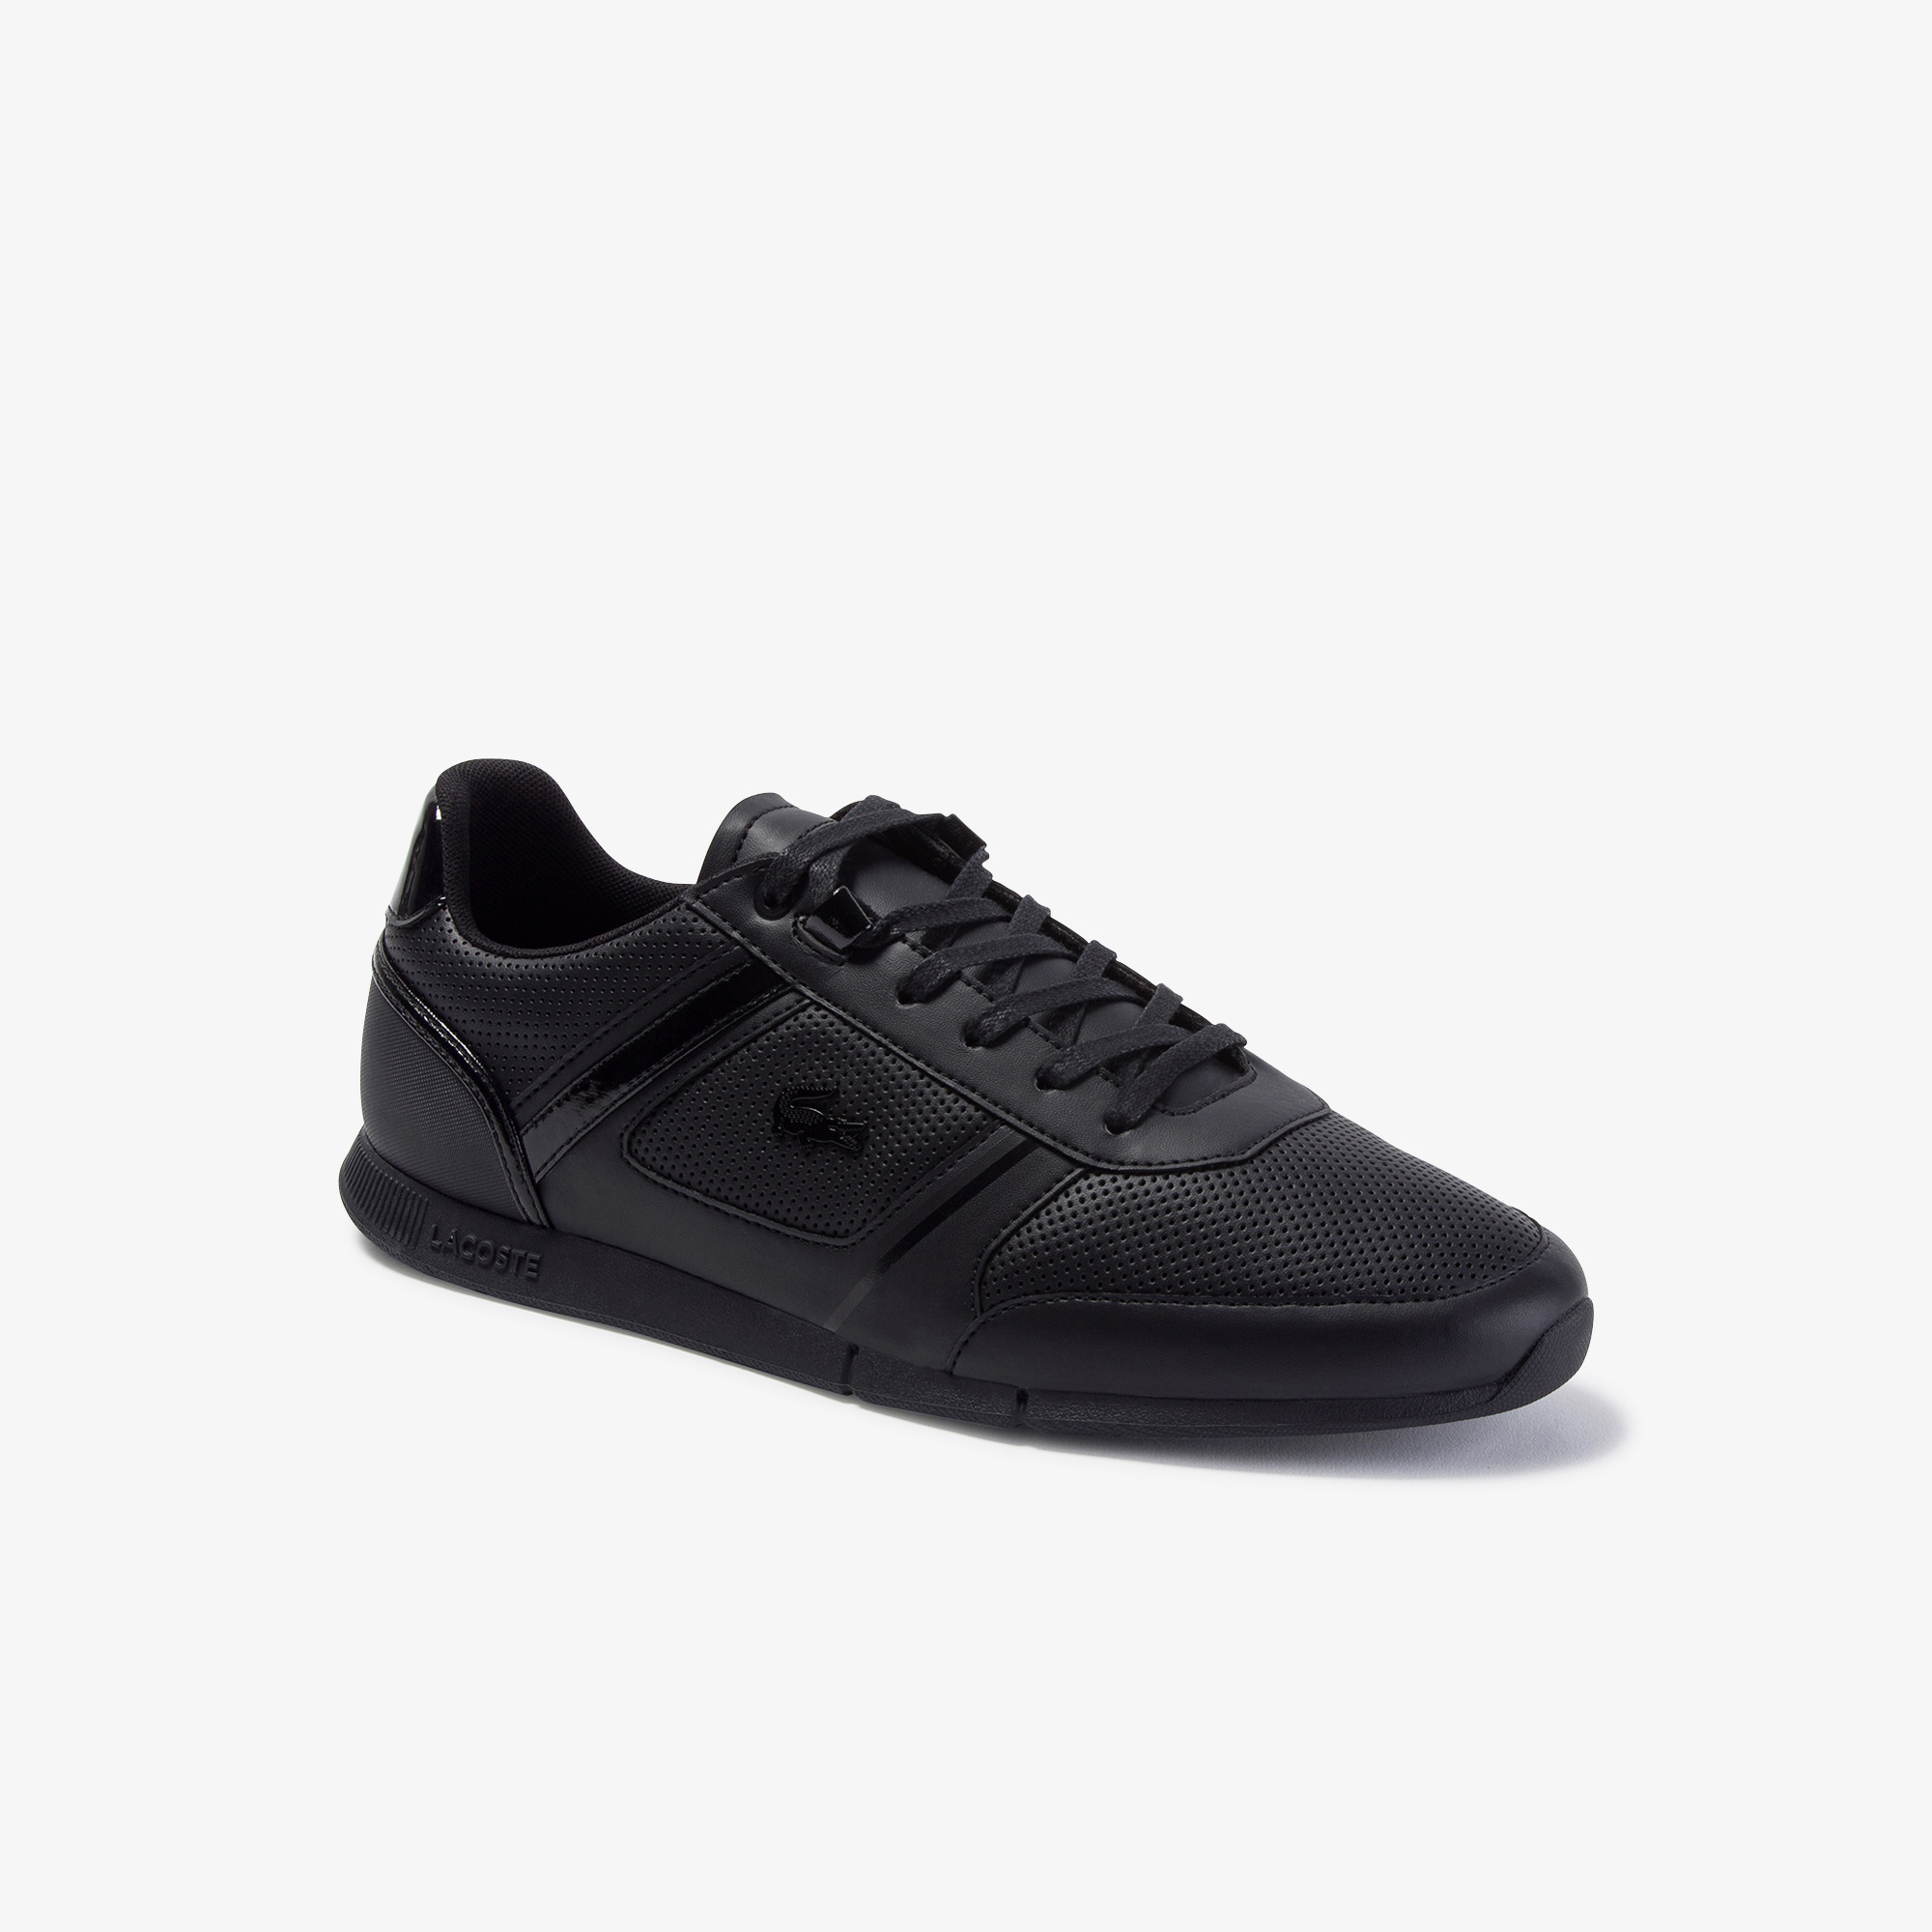 Lacoste Menerva 120 2 Męskie Sneakersy